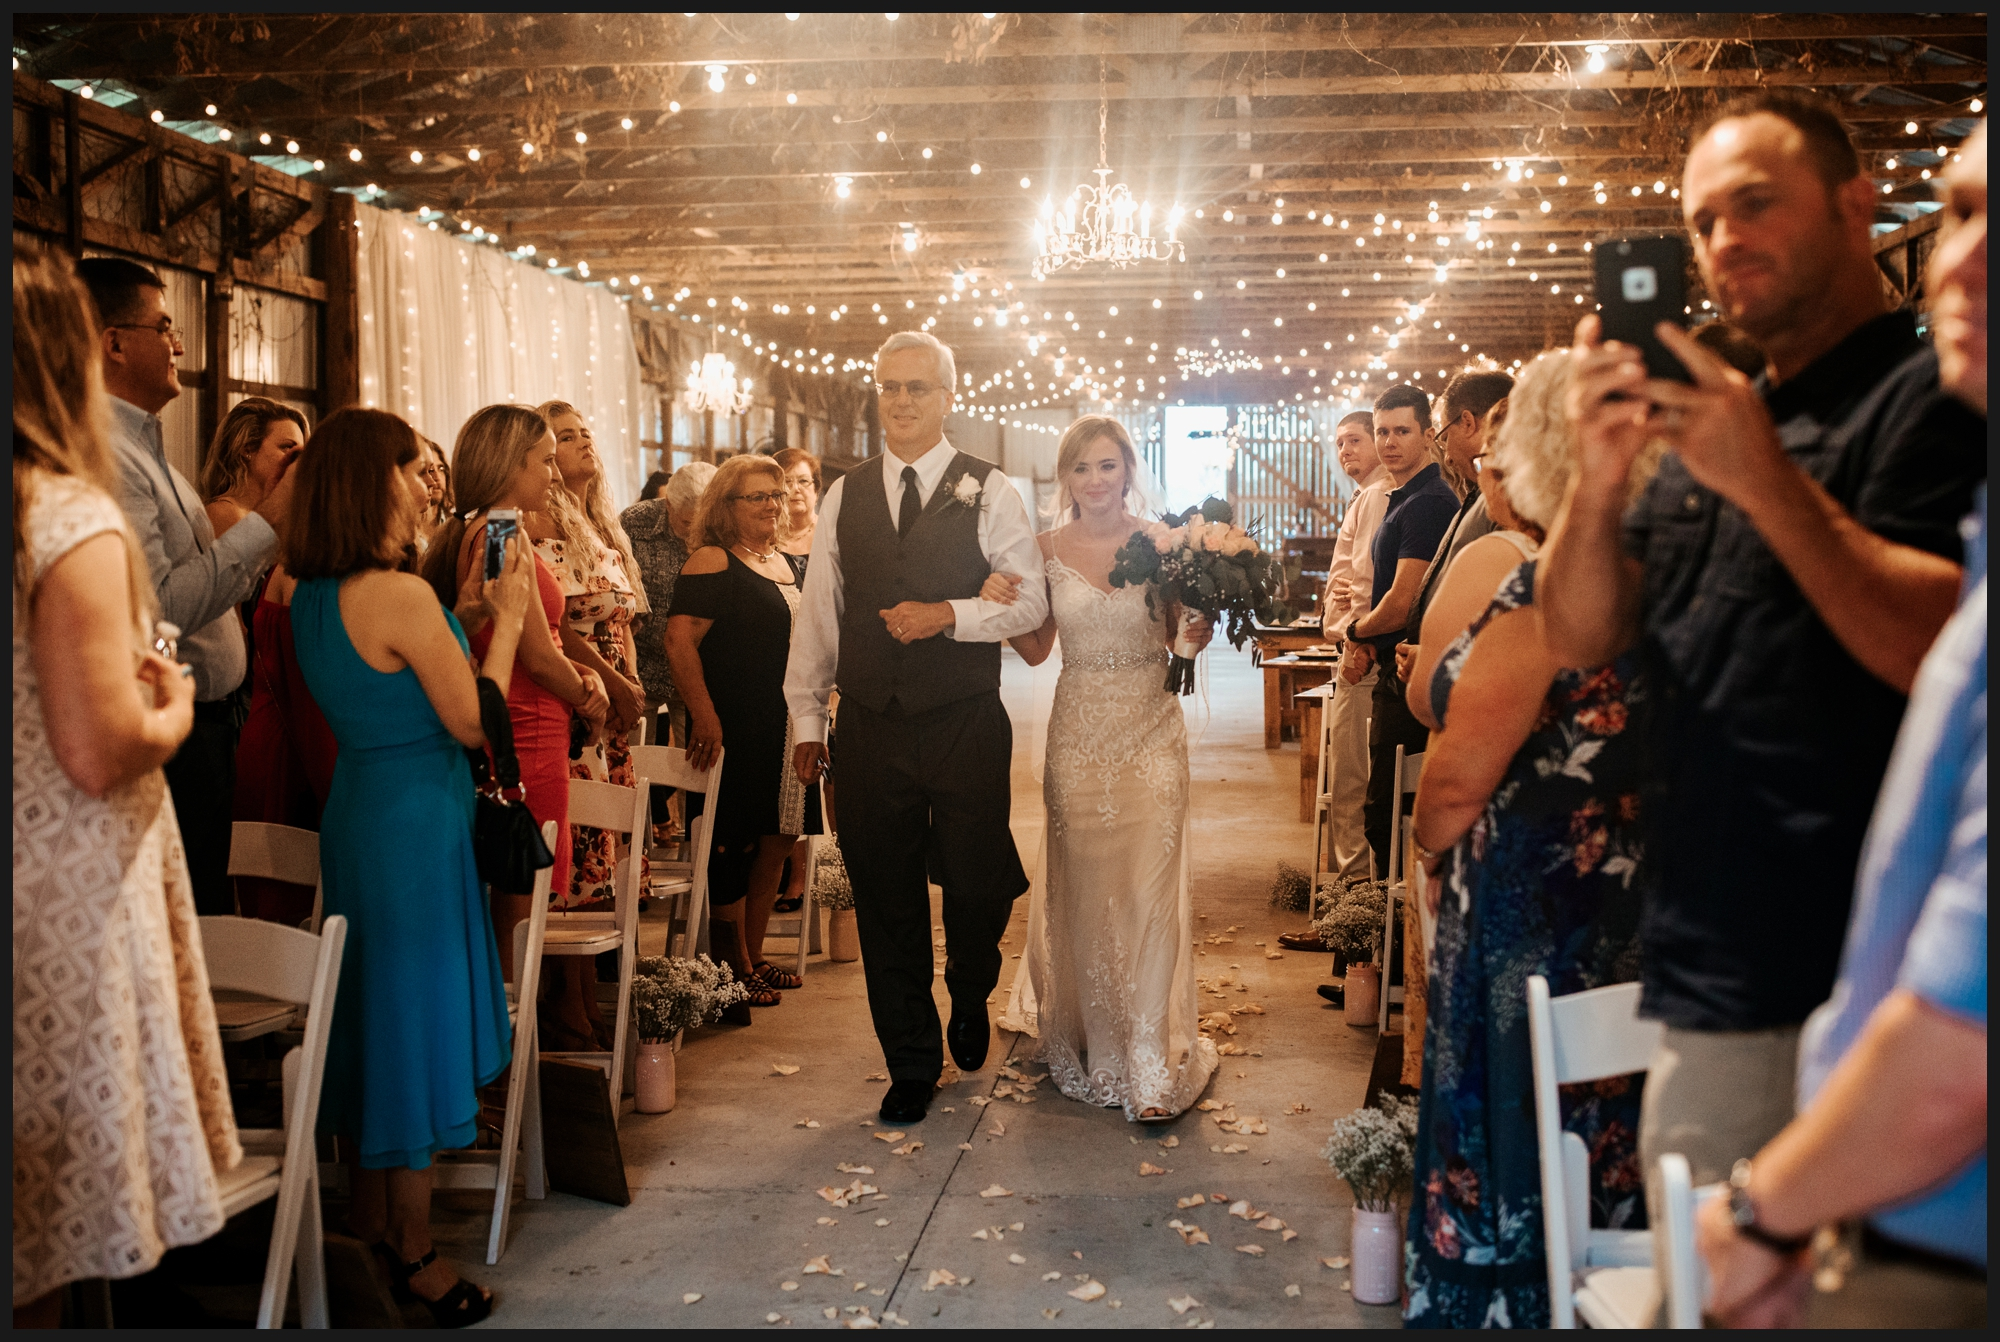 Orlando-Wedding-Photographer-destination-wedding-photographer-florida-wedding-photographer-hawaii-wedding-photographer_0305.jpg